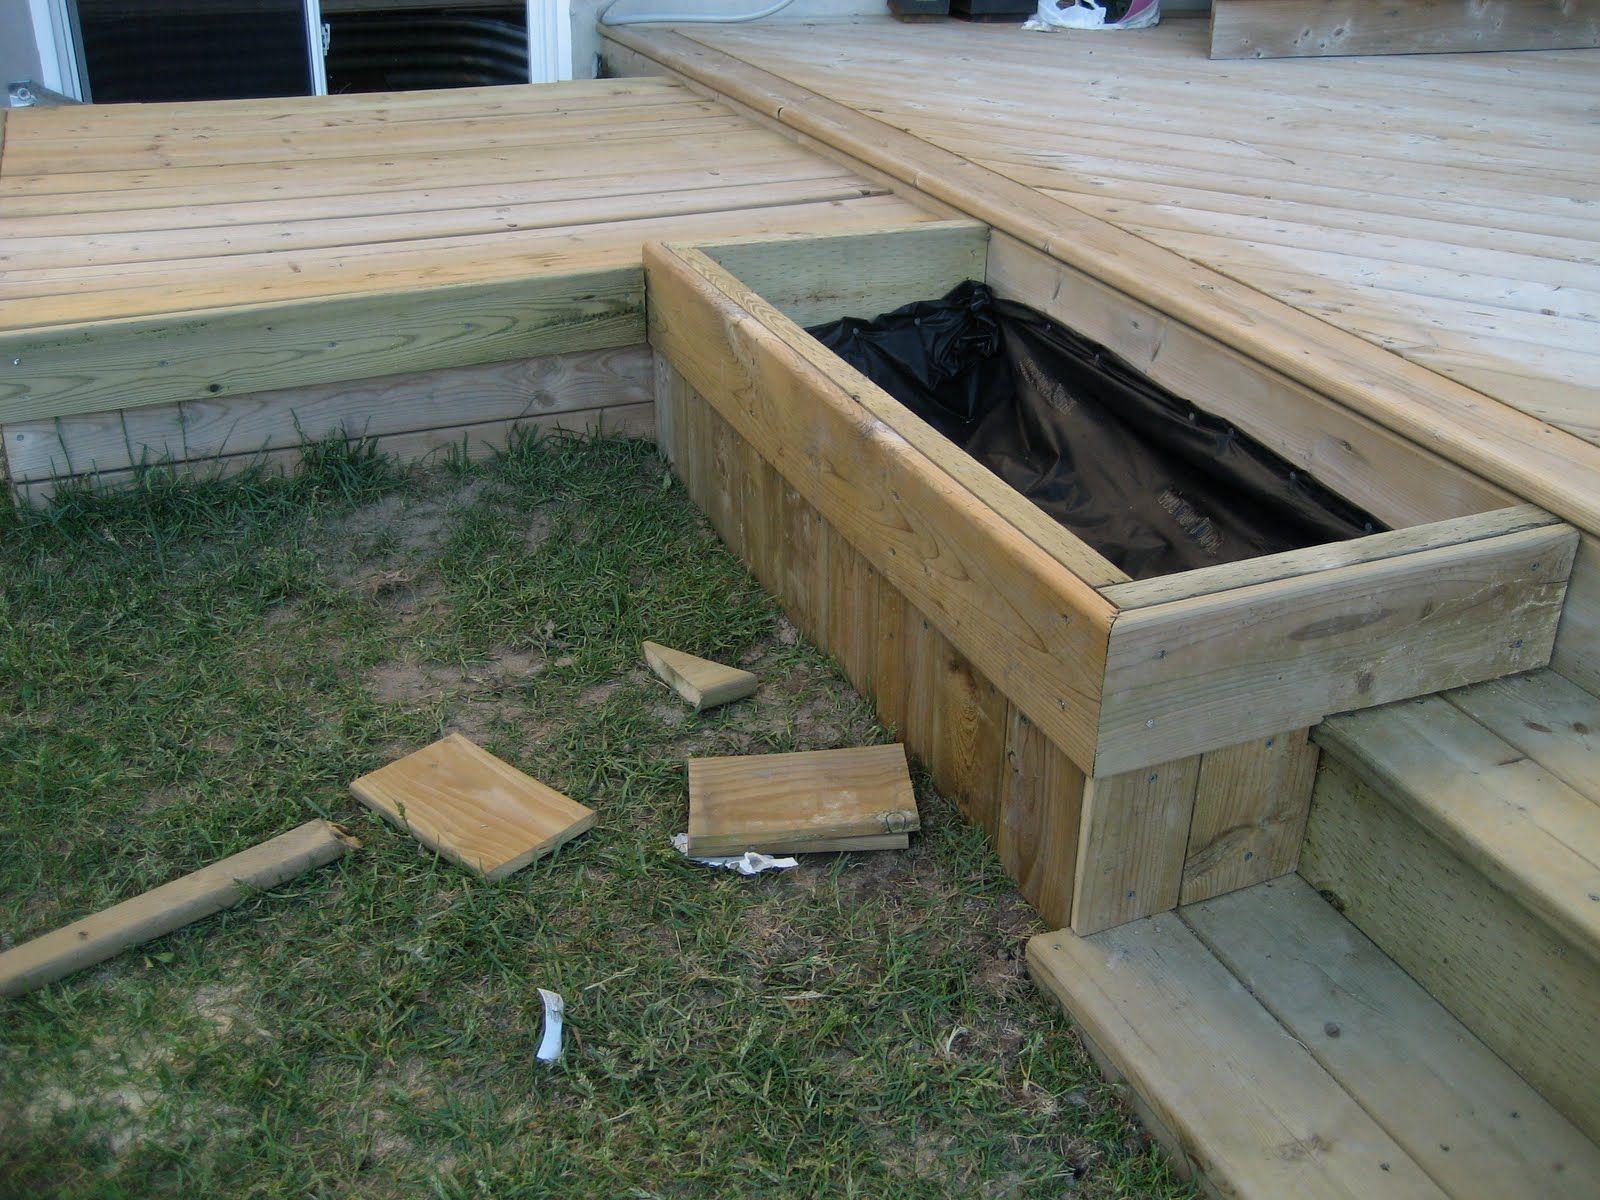 Diy Planter In Decked Steps Outdoor Planter Box Plans Outdoor Planter Boxes Patio Planter Boxes